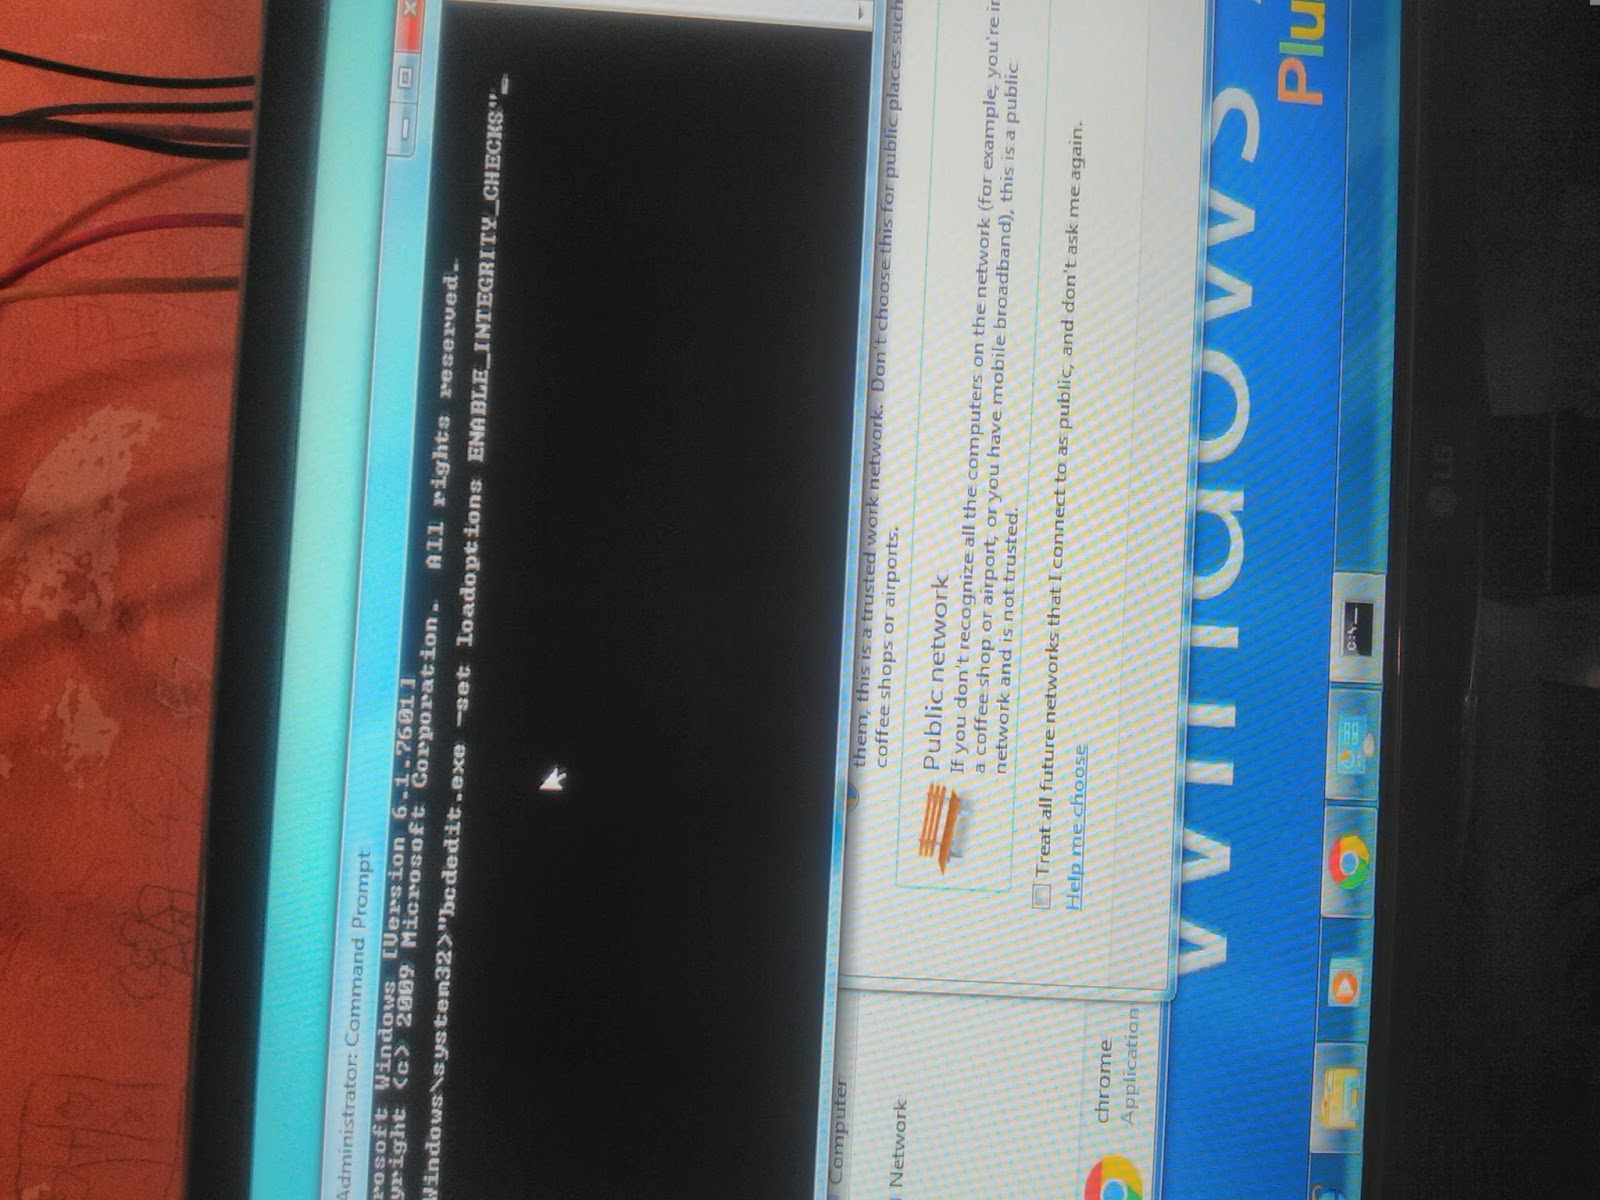 Myandromaxesflashing blogspot com: MENGATASI FAILED SAHARA